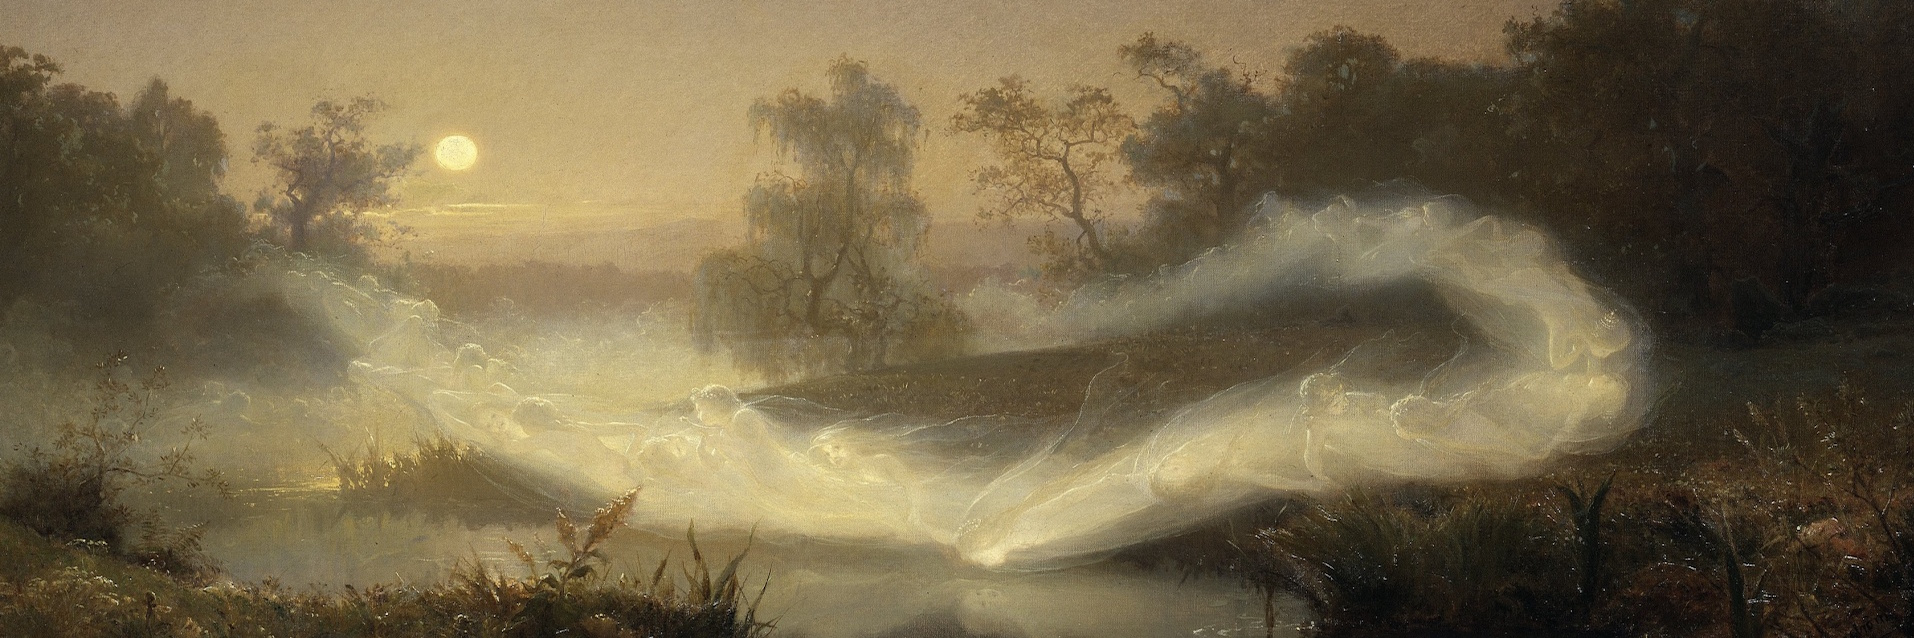 Teit Kanstrup - 'Elverskud' af N.W. Gade